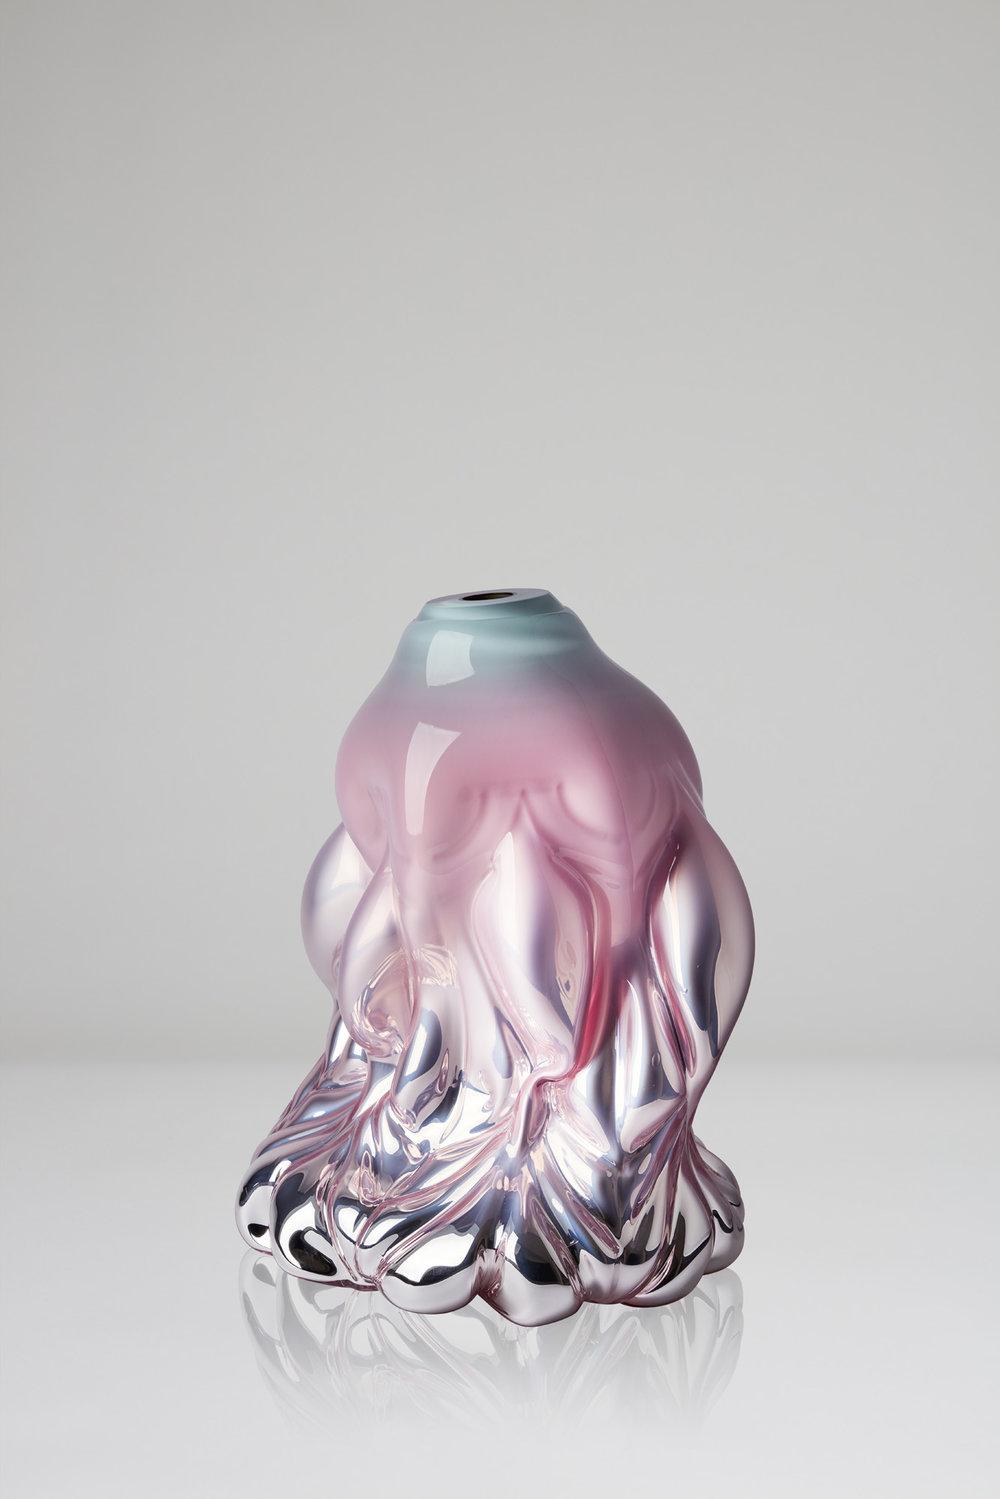 Hanna Hansdotter   Goldfish print, pink celadon metallic , 2018 Shape-blown glass, silver foiled 49 x 34 cm Edition 1 + 2 AP